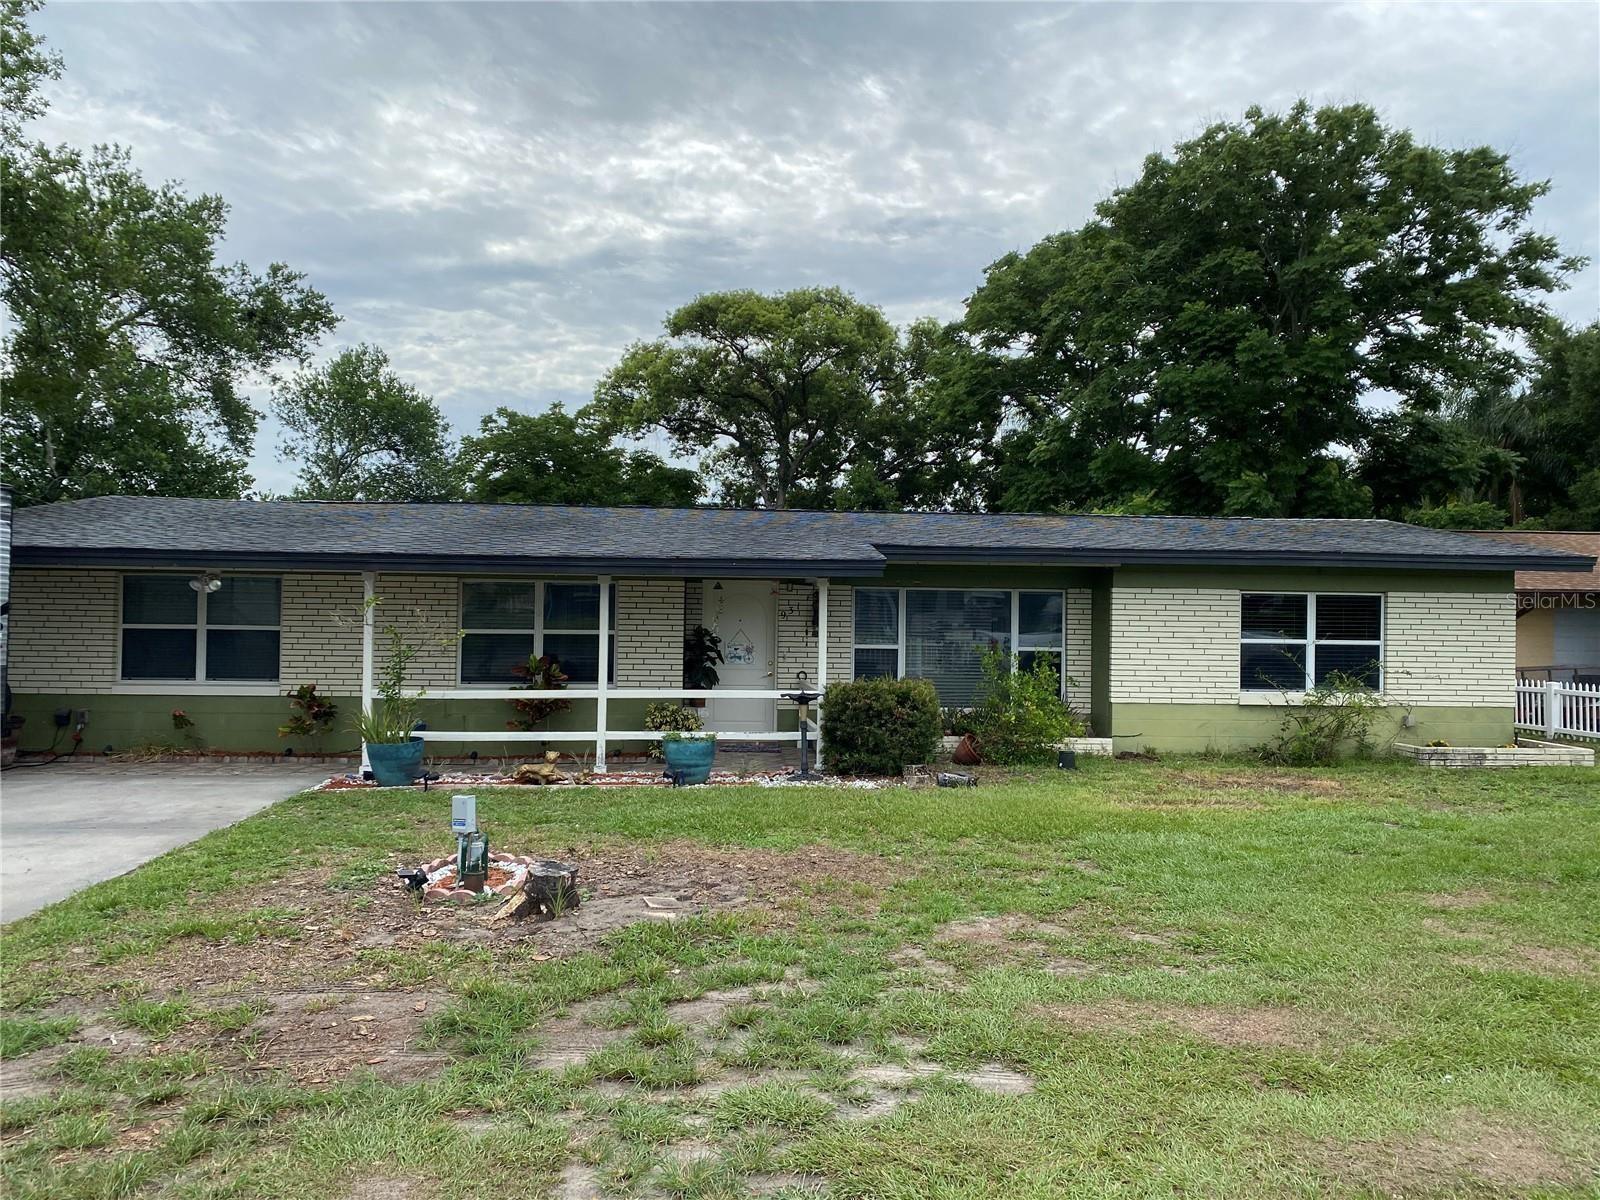 931 W LAKE BRANTLEY ROAD, Altamonte Springs, FL 32714 - #: O5953464